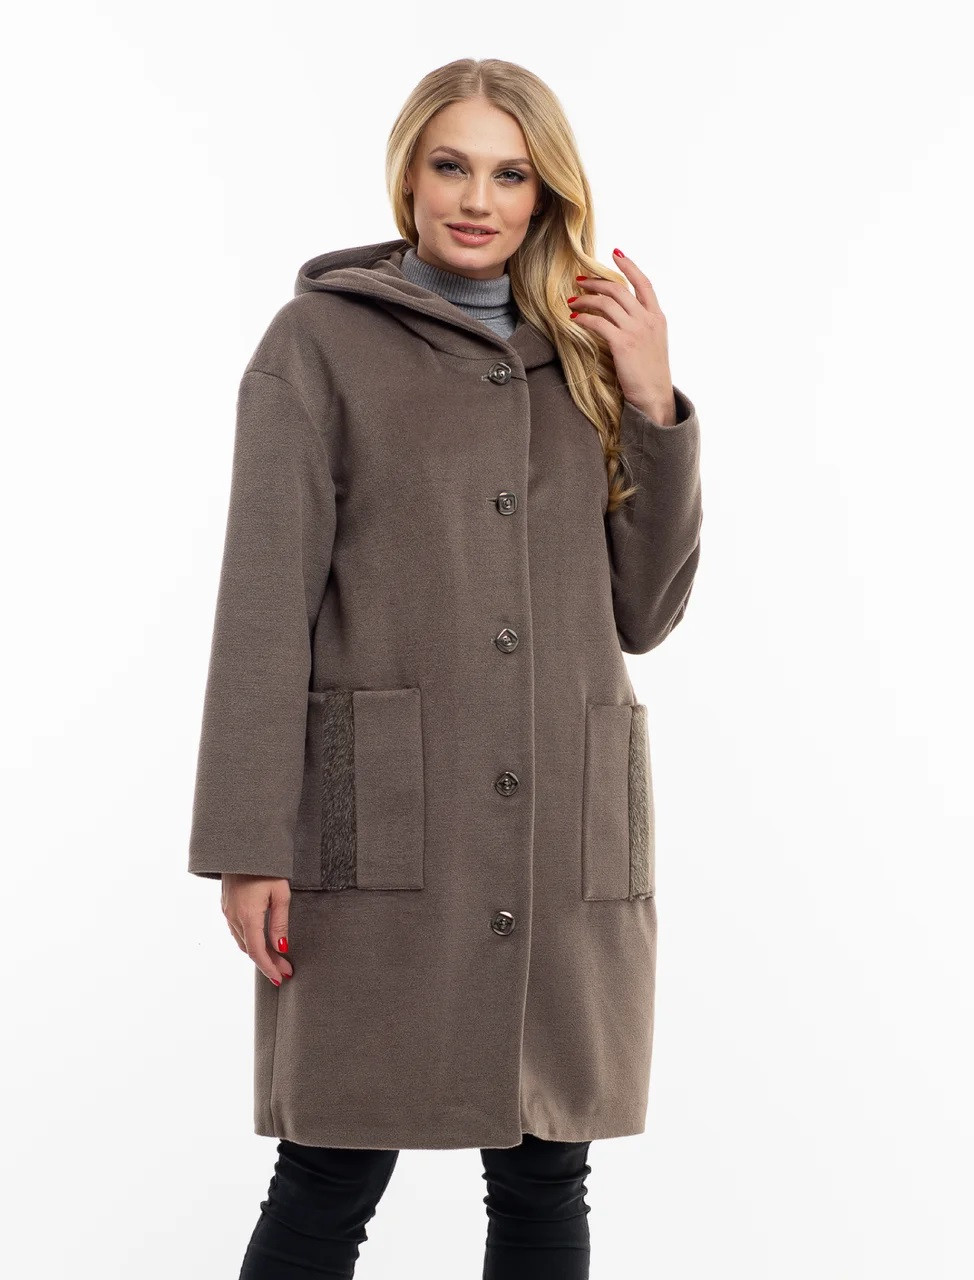 Сіре пальто жіноче-новинка